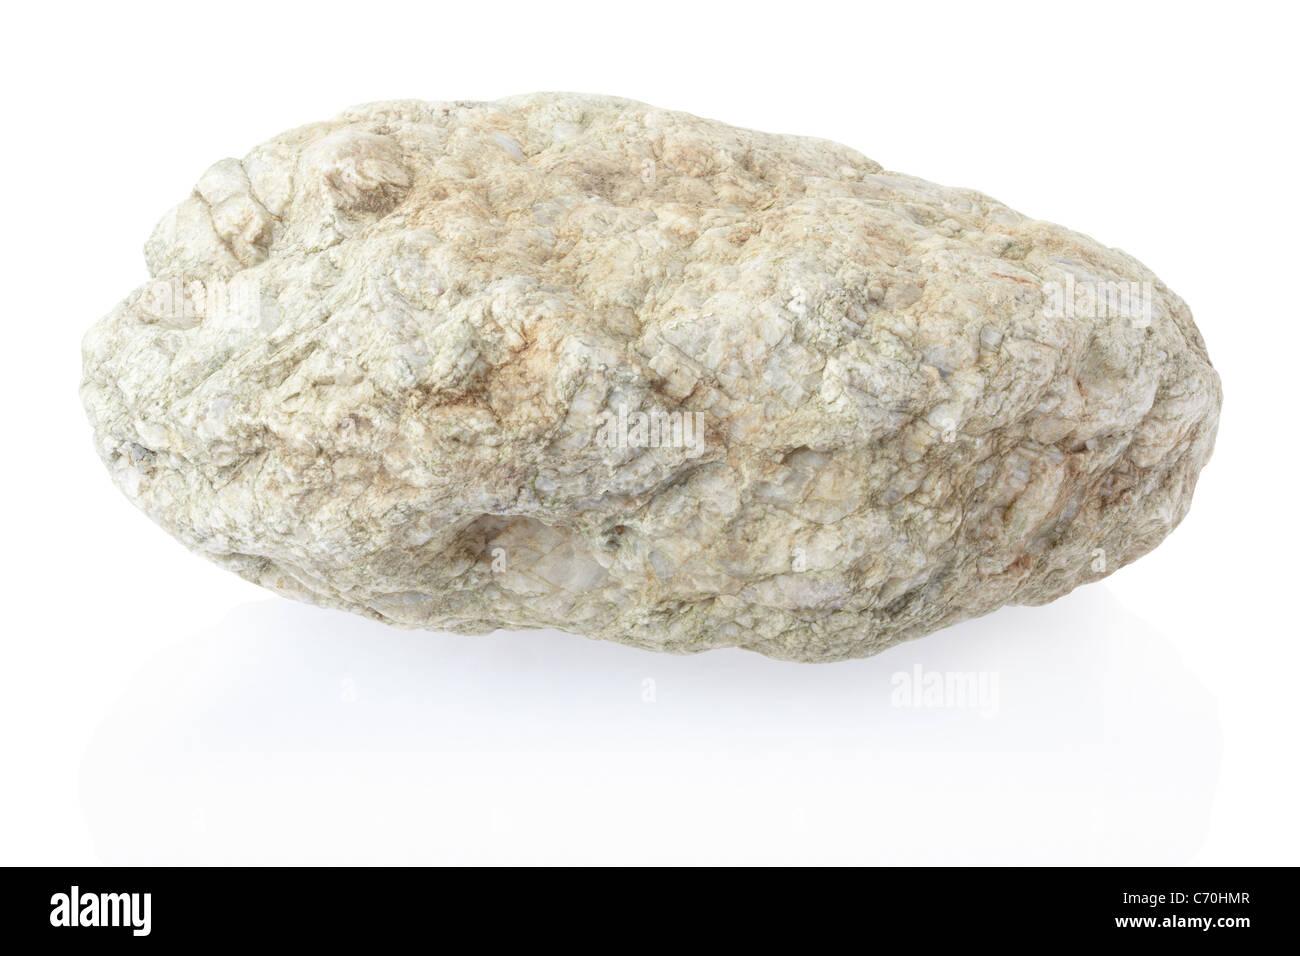 Stone, rock - Stock Image